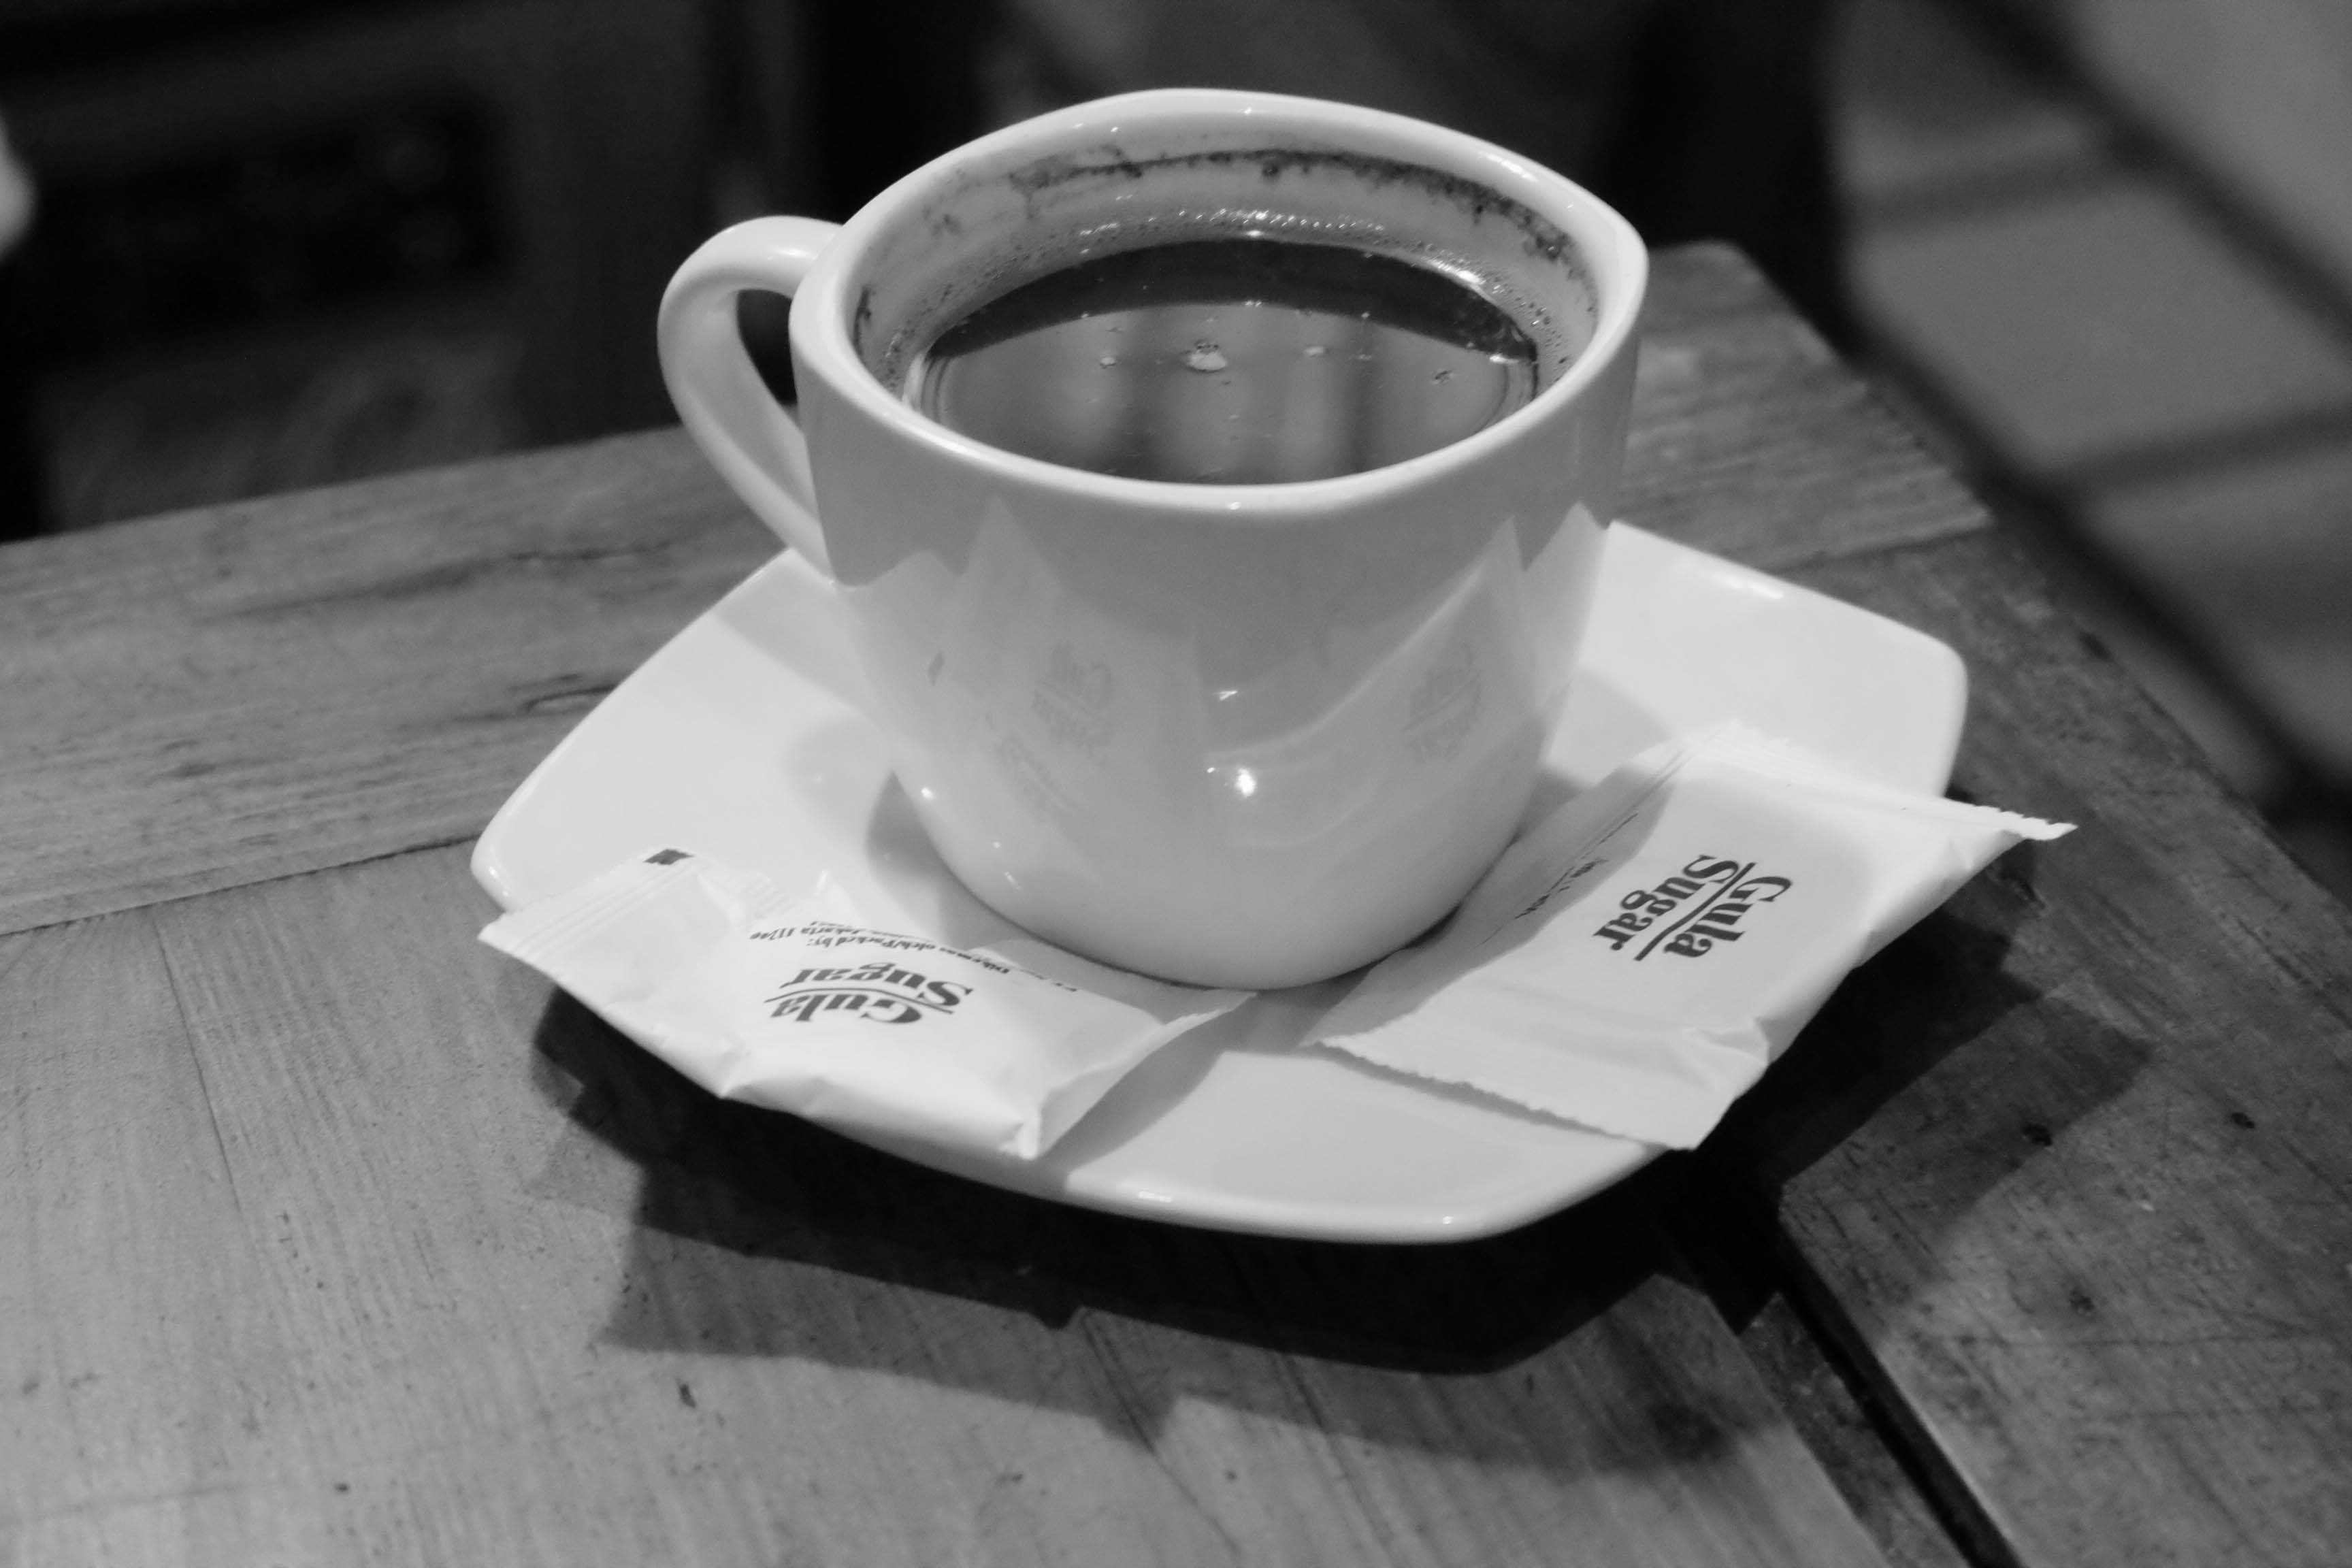 Kafe Kolong Tempat Ngopi Unik Jember Ulinulin Bagi Pecinta Kopi